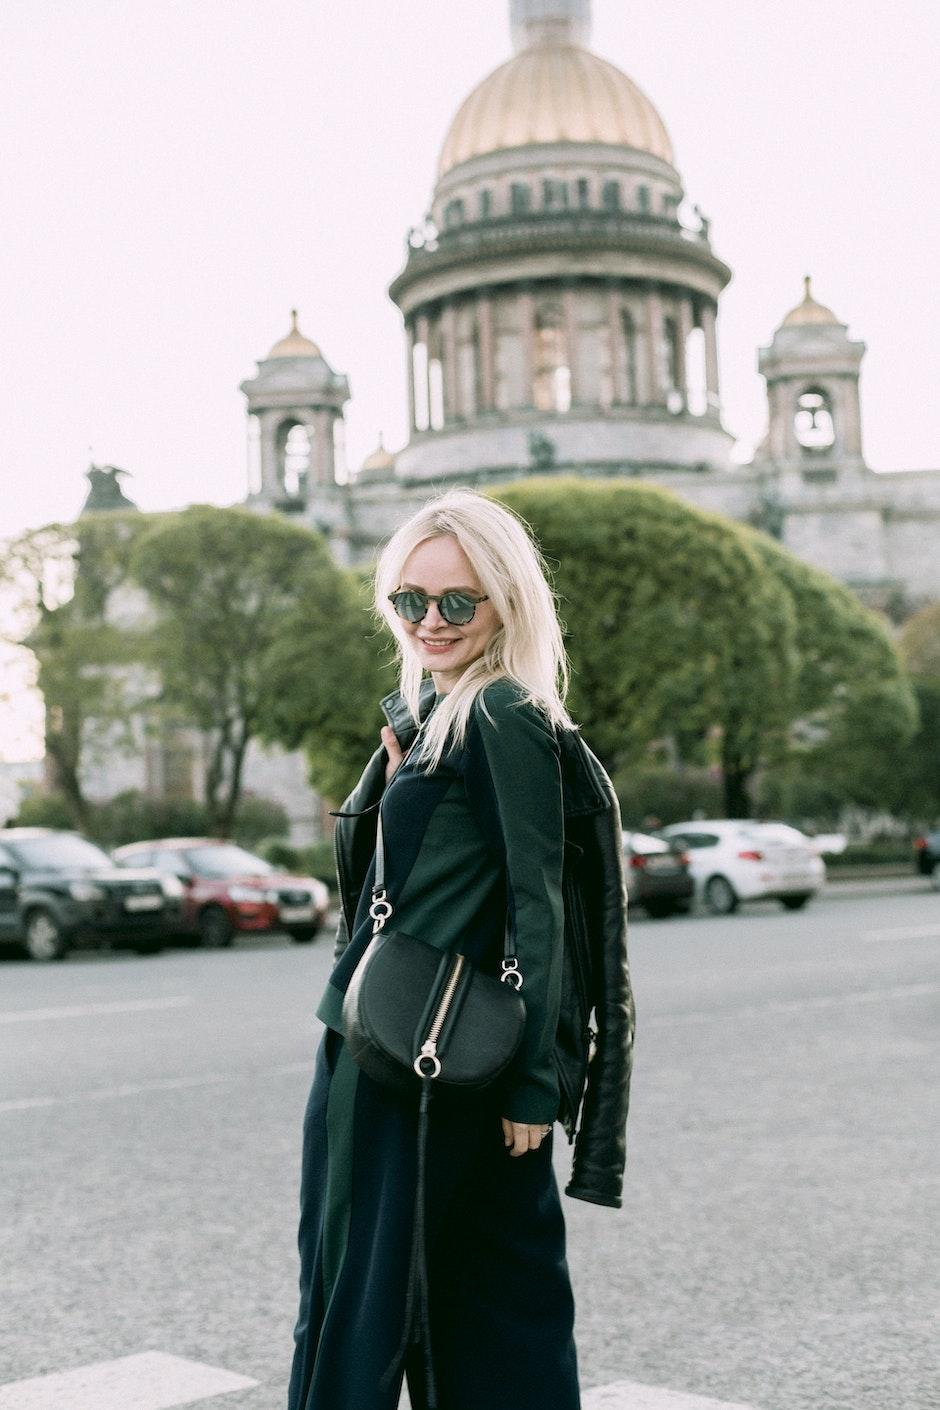 Women's Black Jacket and Black Skirt Near Building